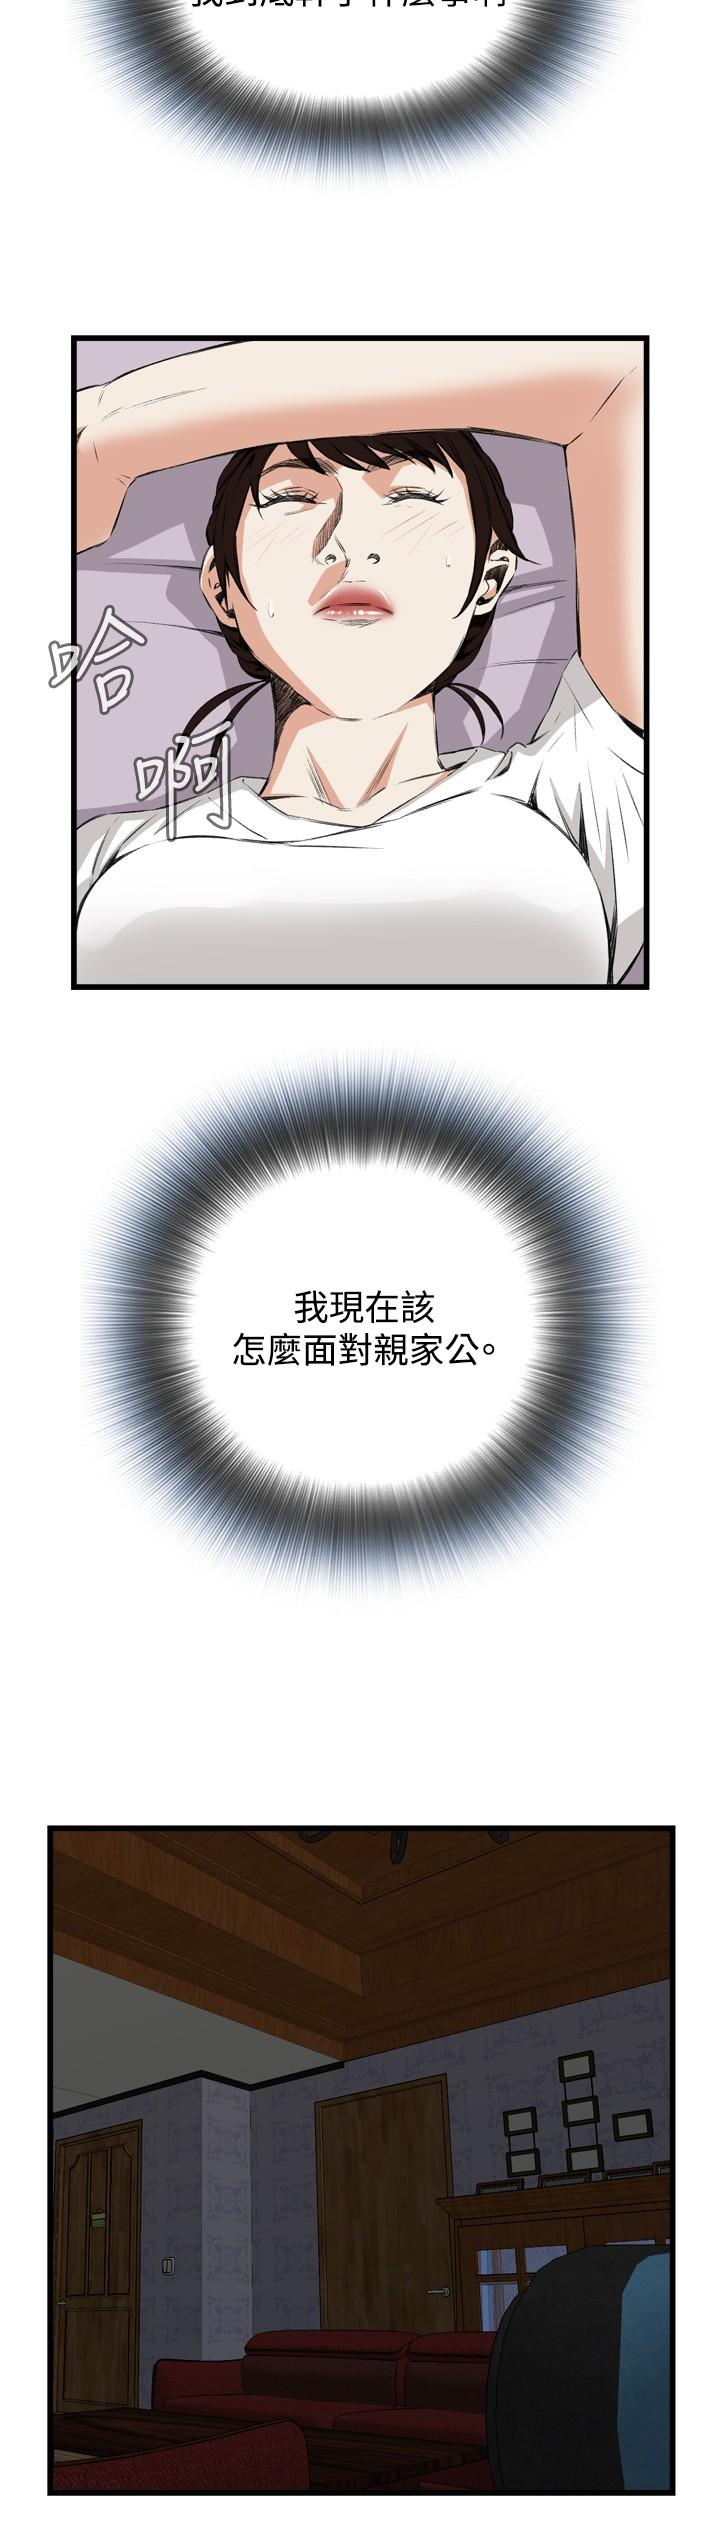 Take a Peek 偷窥 Ch.39~55 [Chinese]中文 386